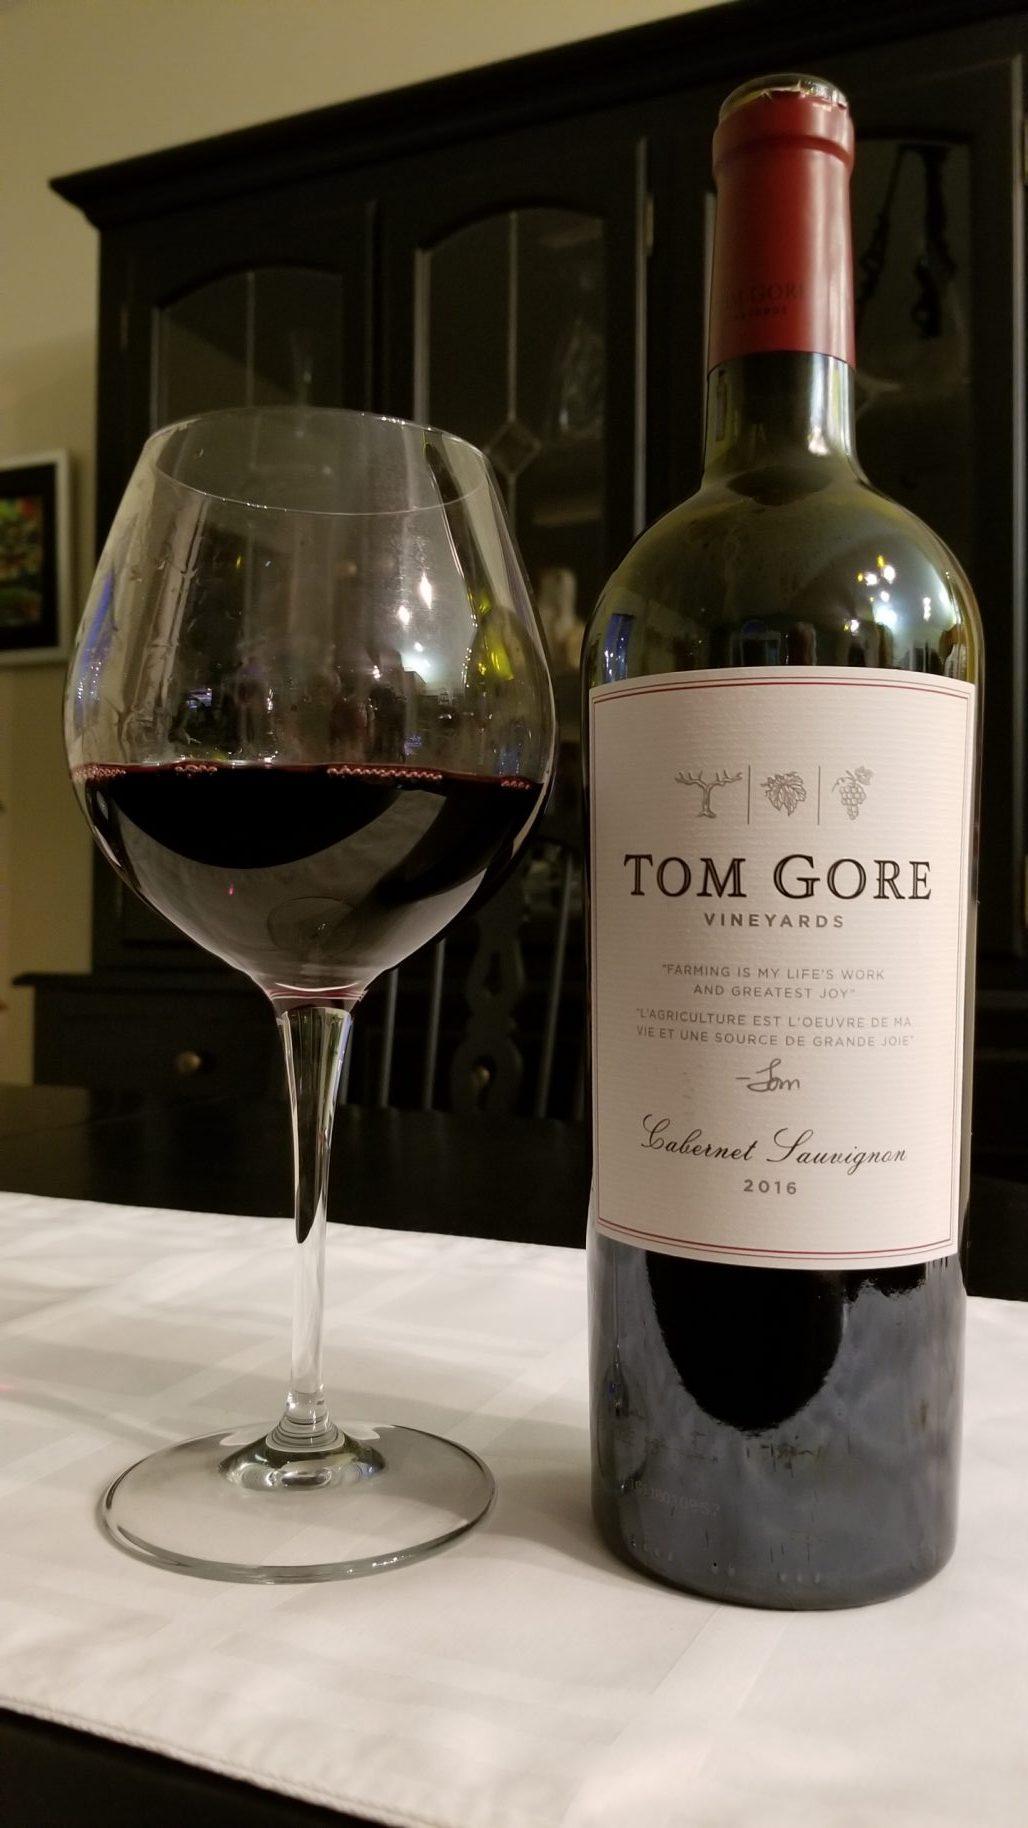 $19.95 - Tom Gore Cabernet Sauvignon 2016